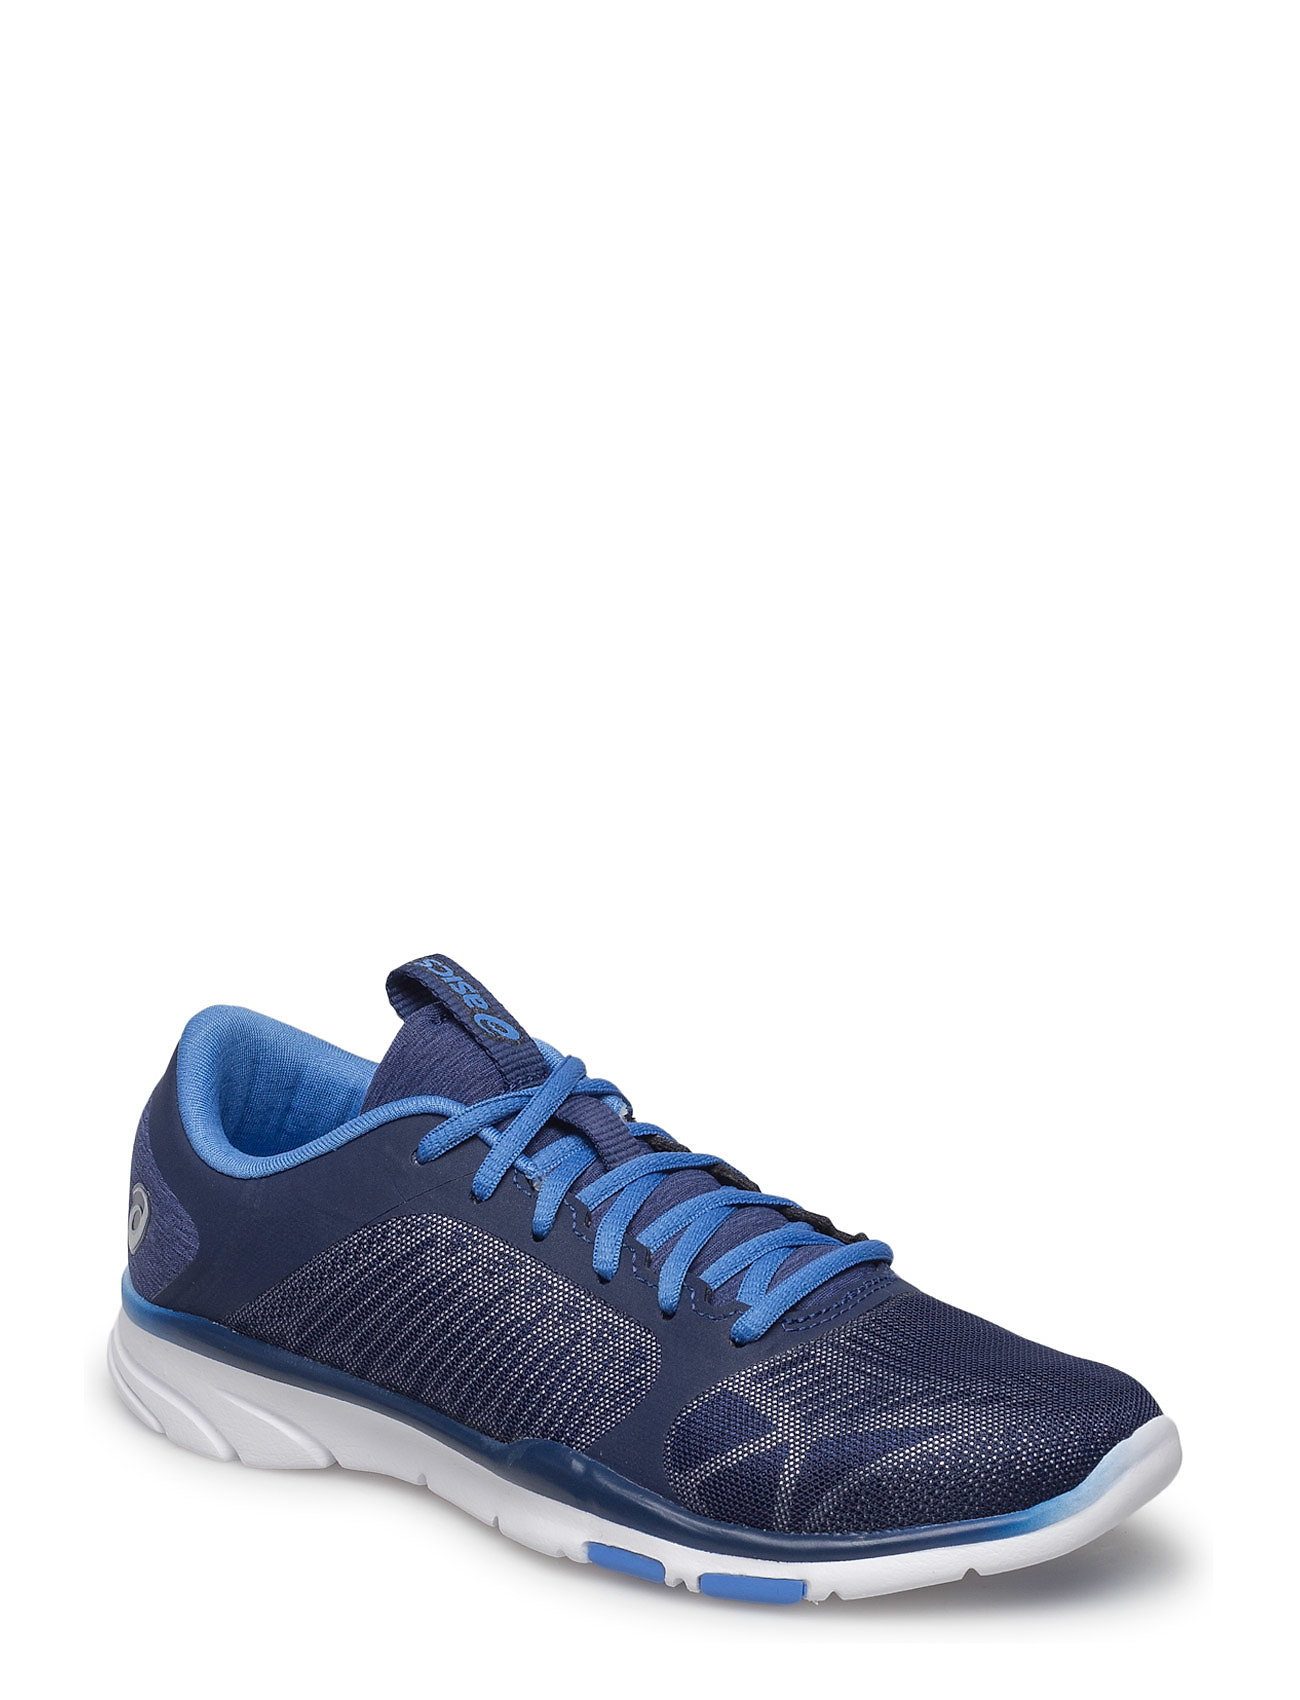 Gel-Fit Tempo 3 Asics Sports sko til Damer i